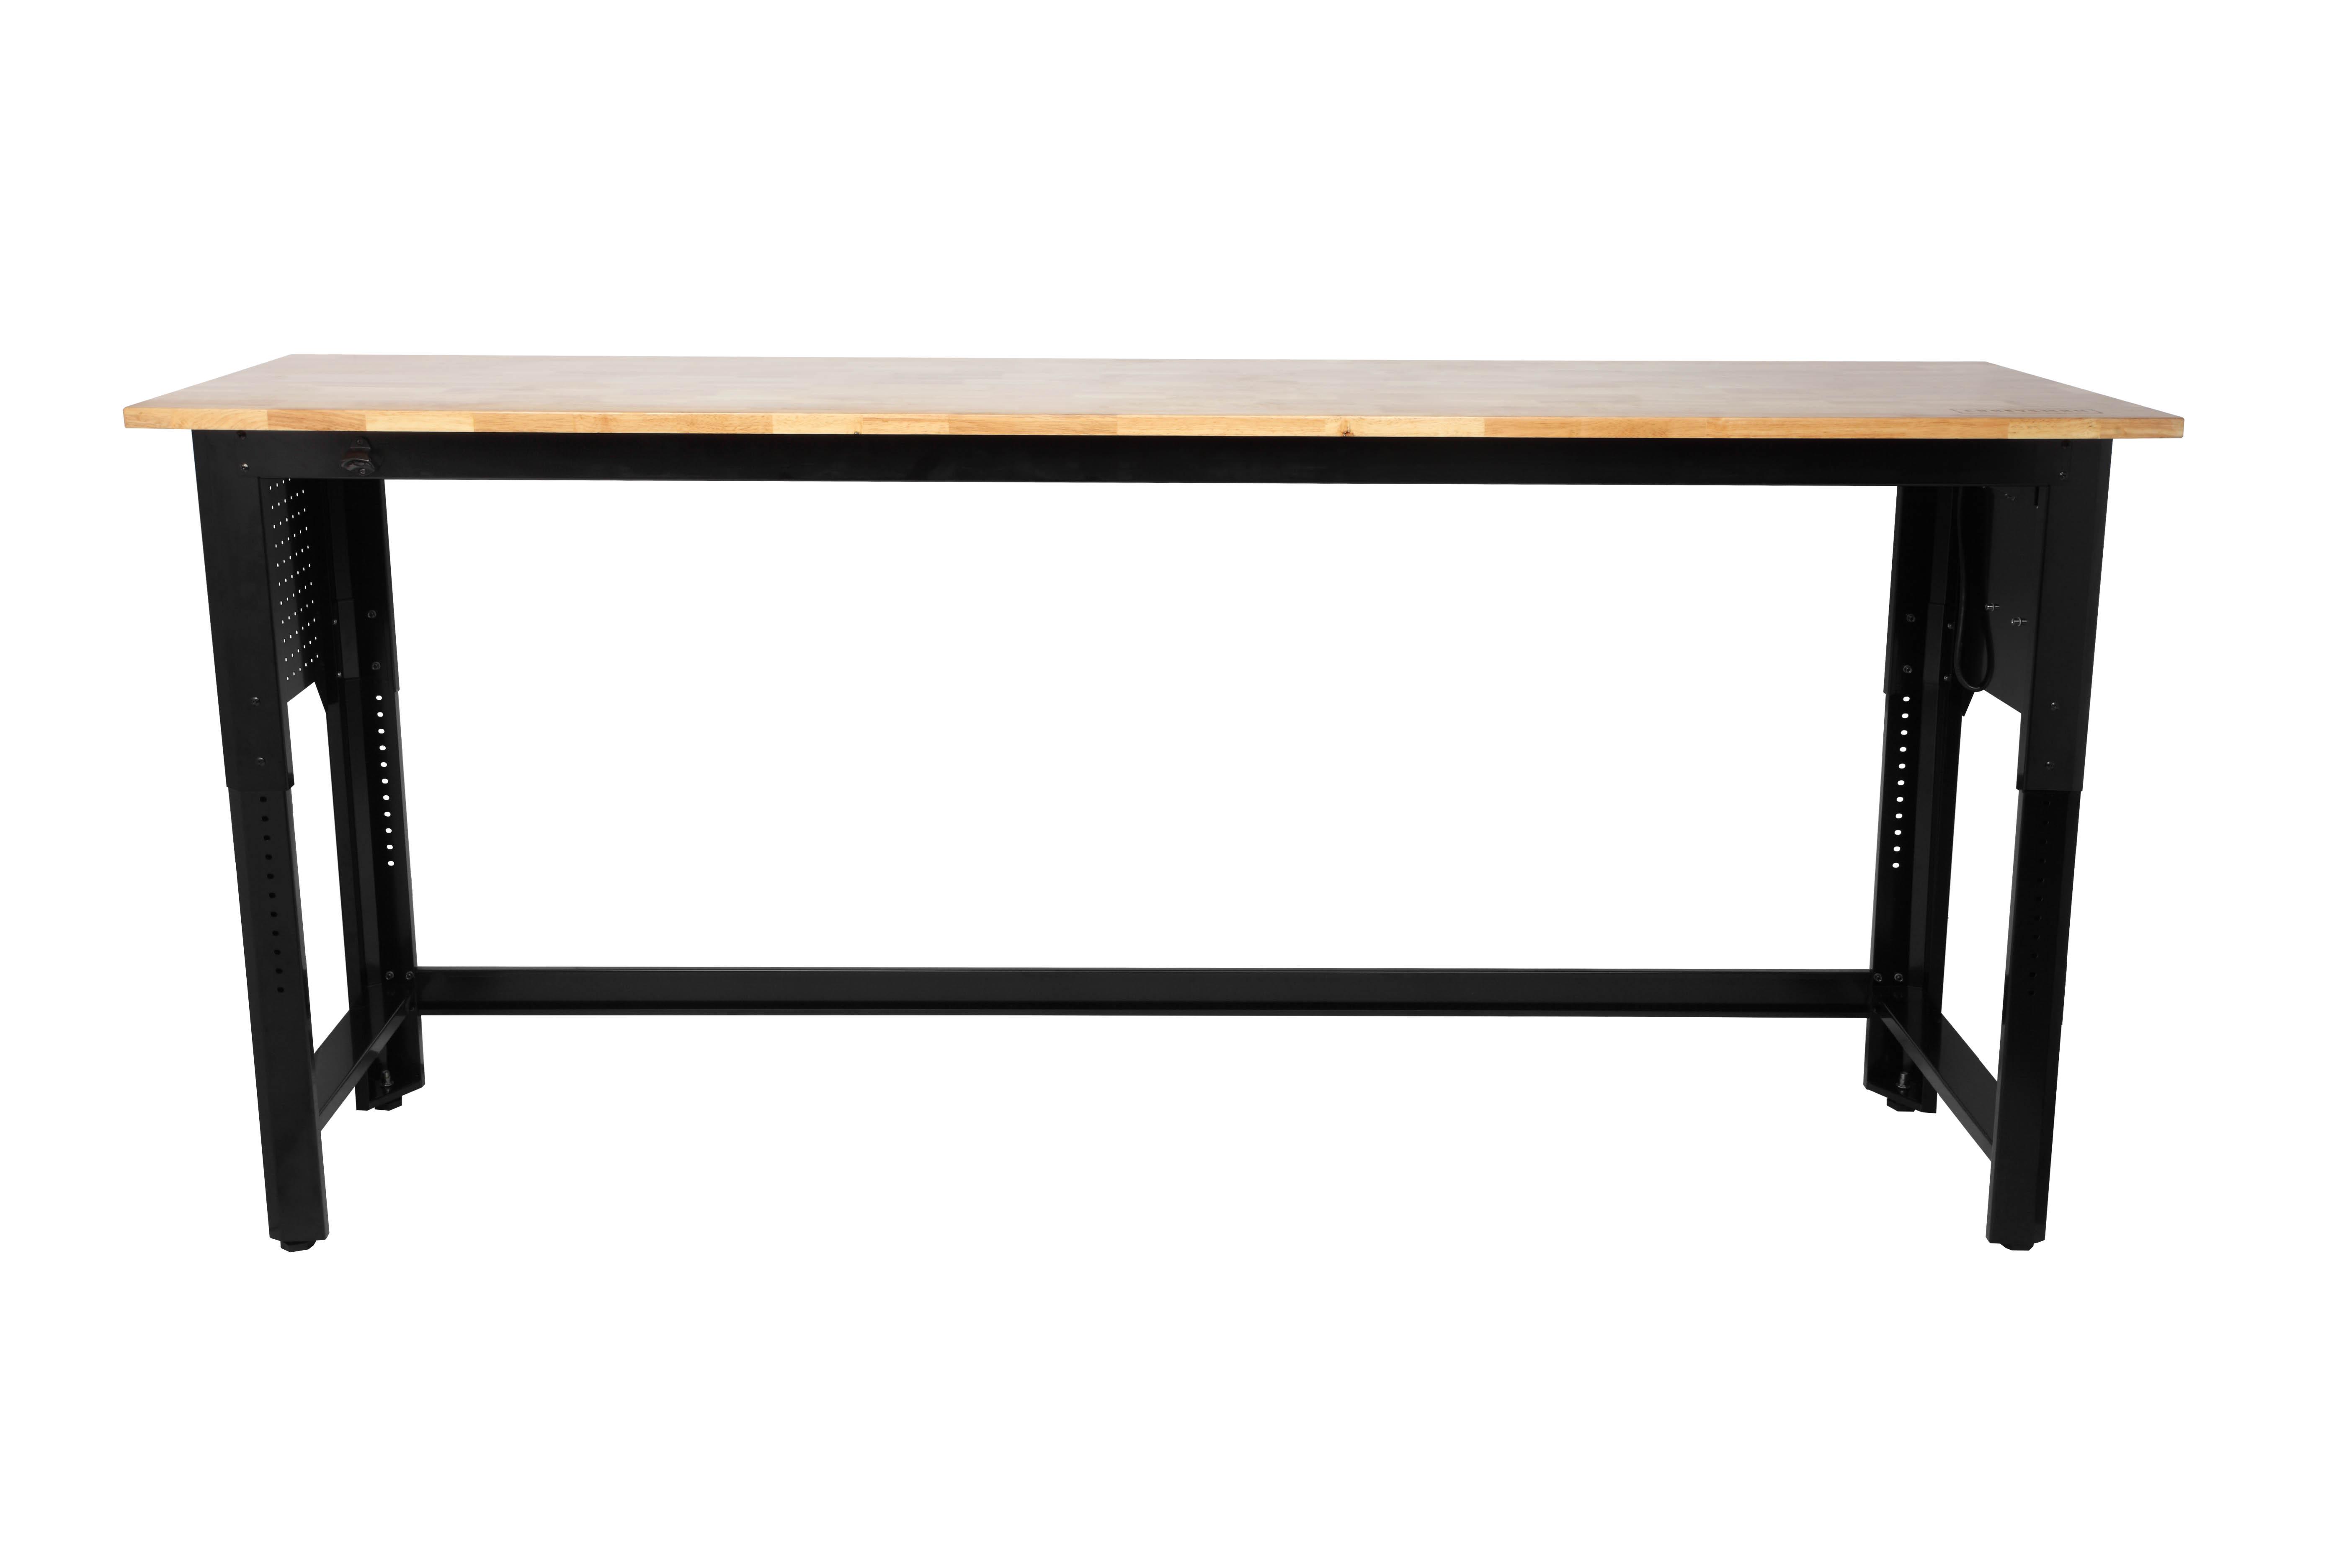 Craftsman 96 in. Adjustable Height Workbench